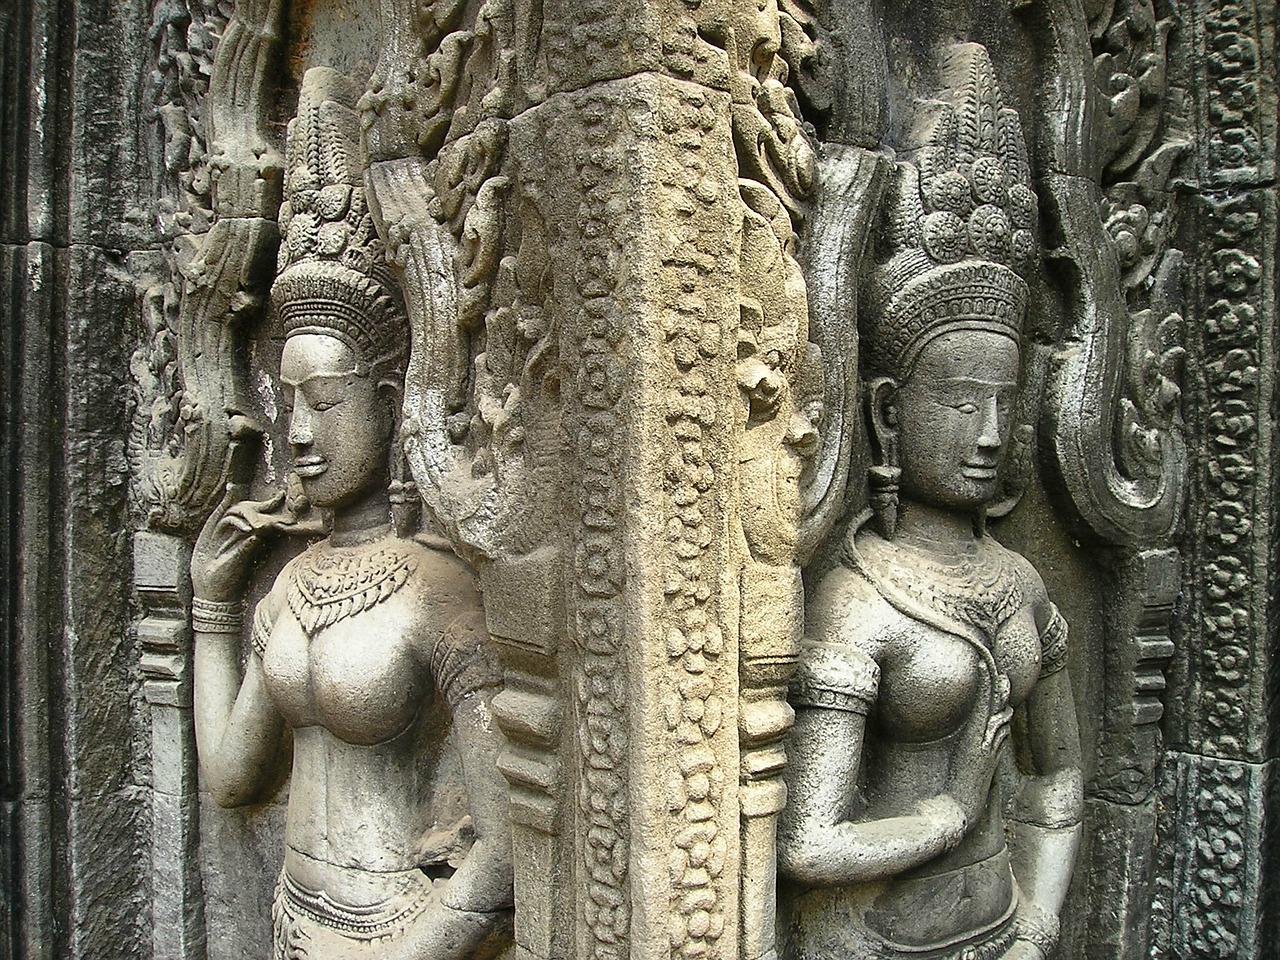 Sanatana Dharma czy hinduizm?